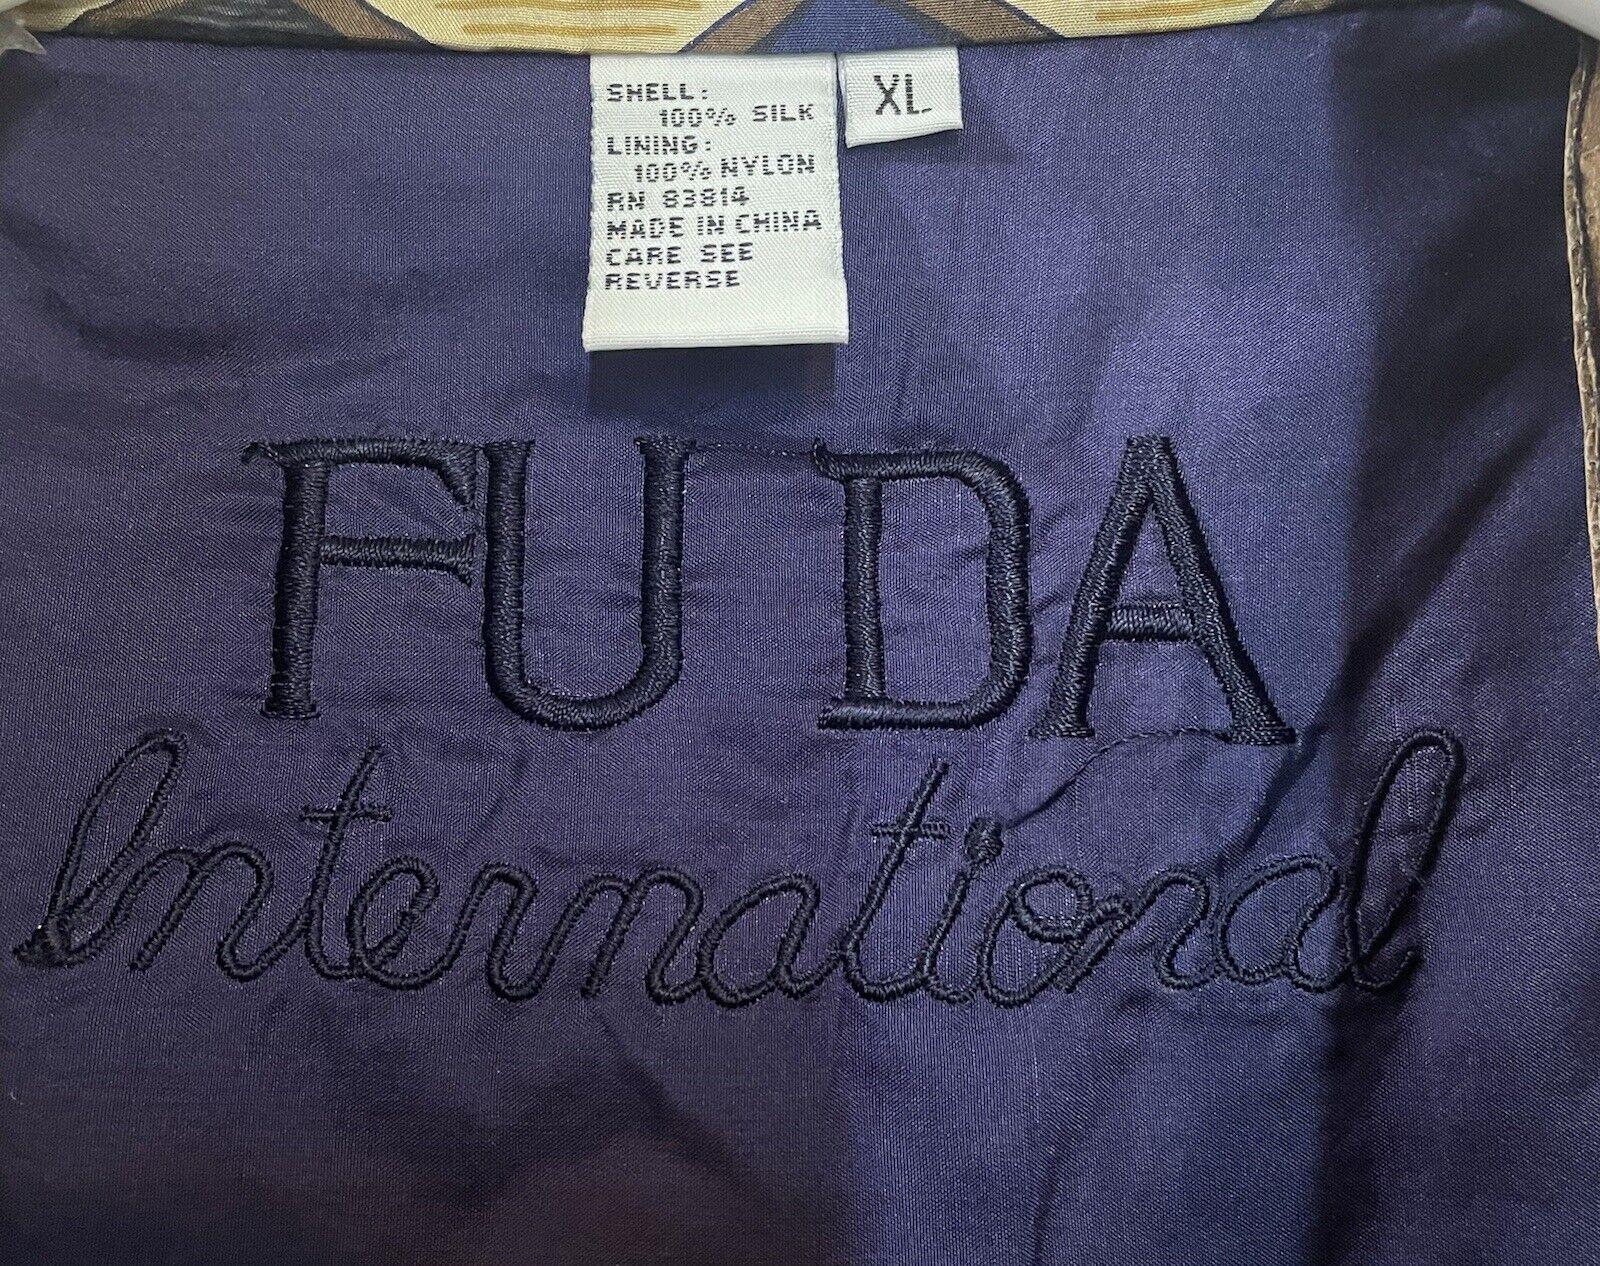 Vintage Fuda International Puffer Jacket XL - image 4